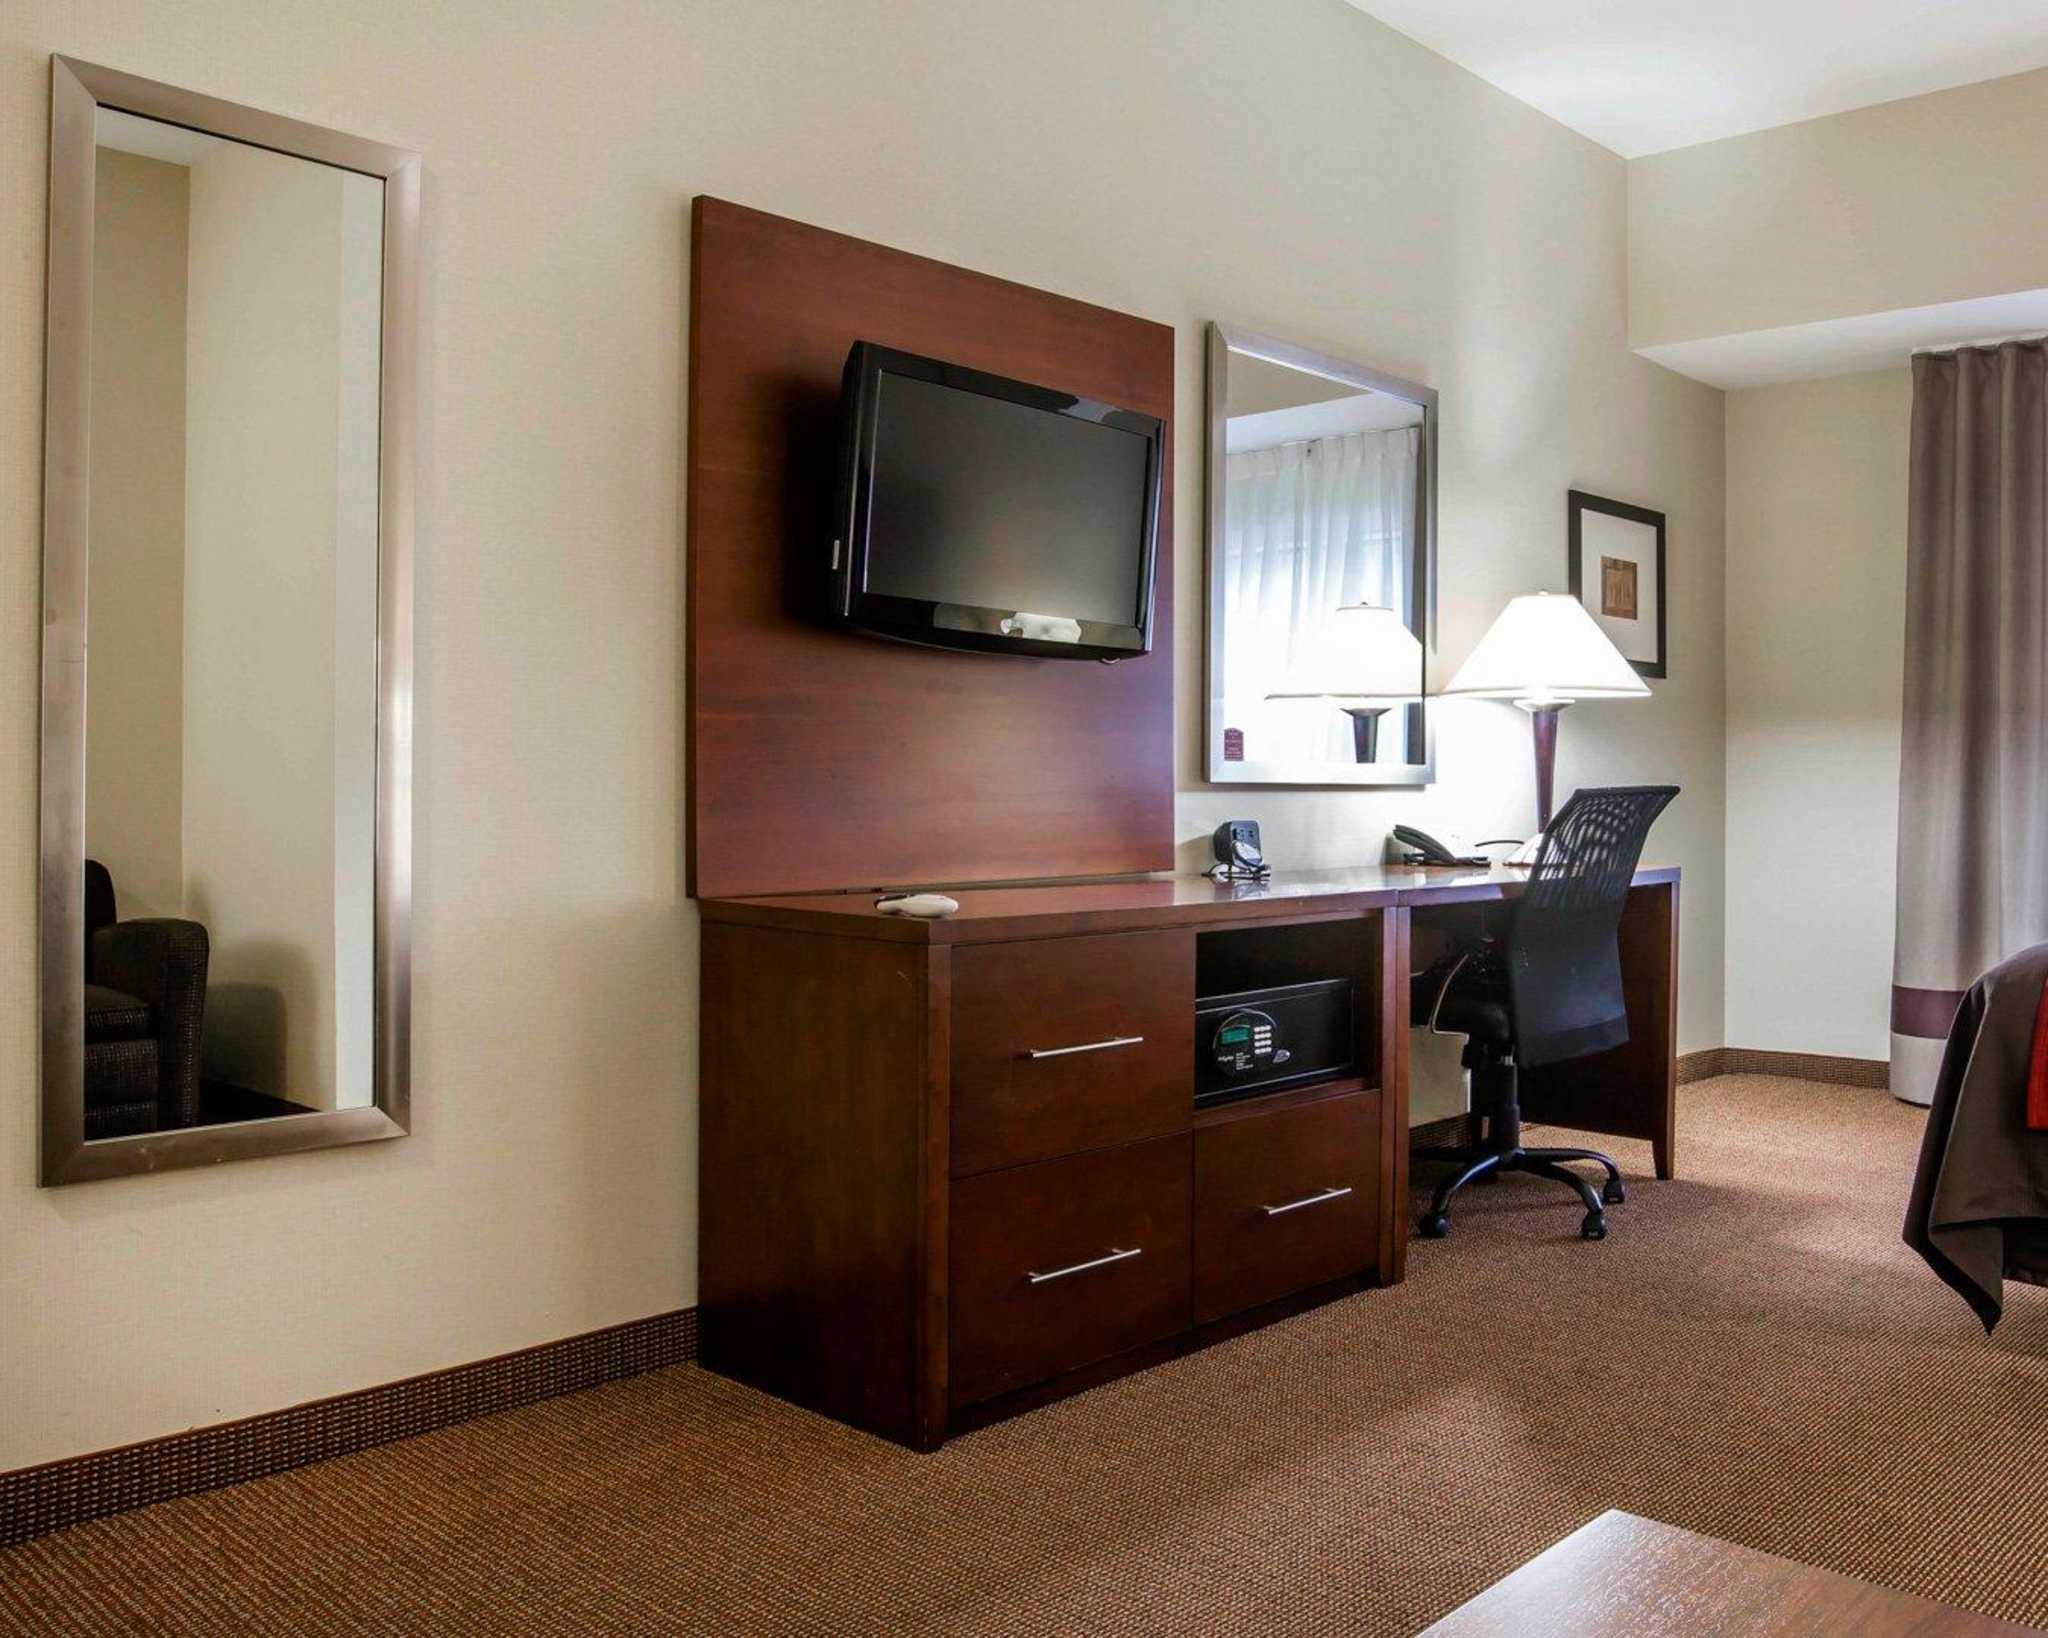 Comfort Inn & Suites adj to Akwesasne Mohawk Casino image 46